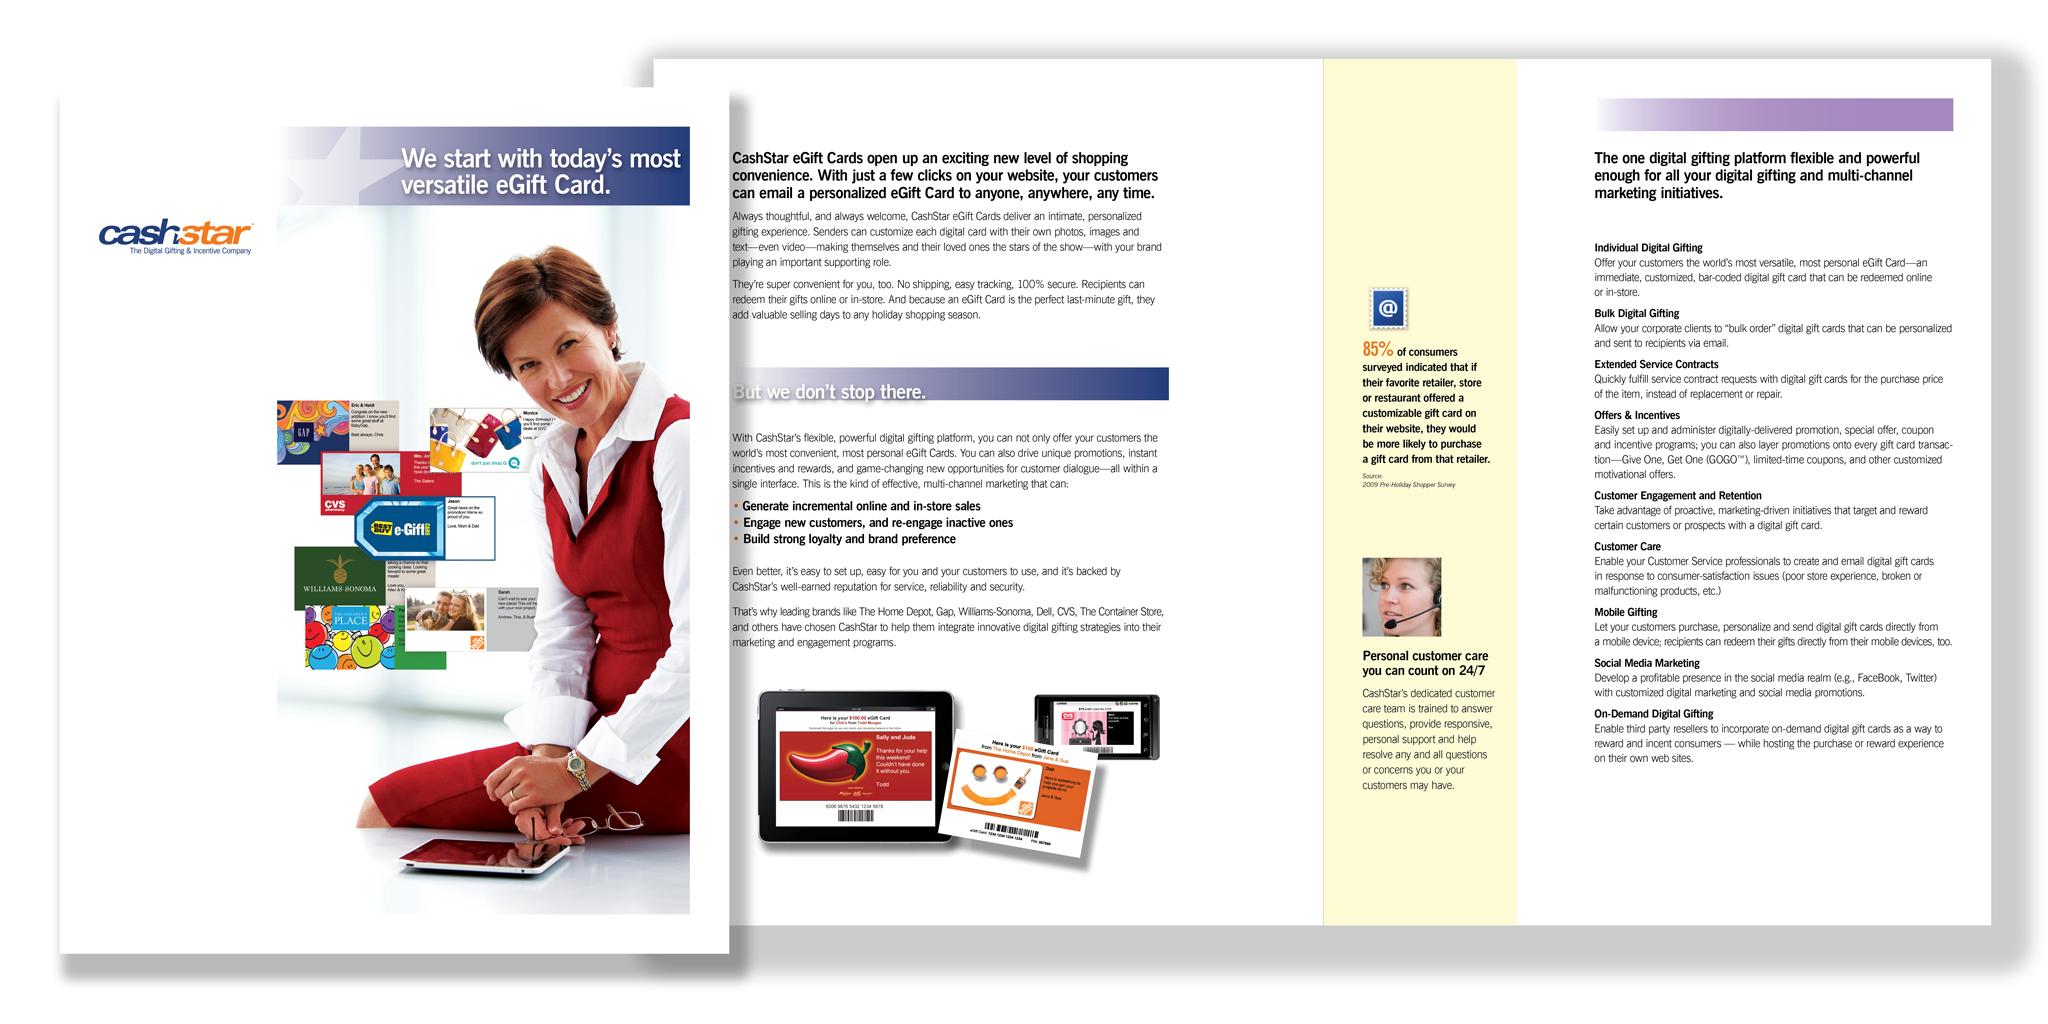 CS_Platform_Brochure_1024.jpg